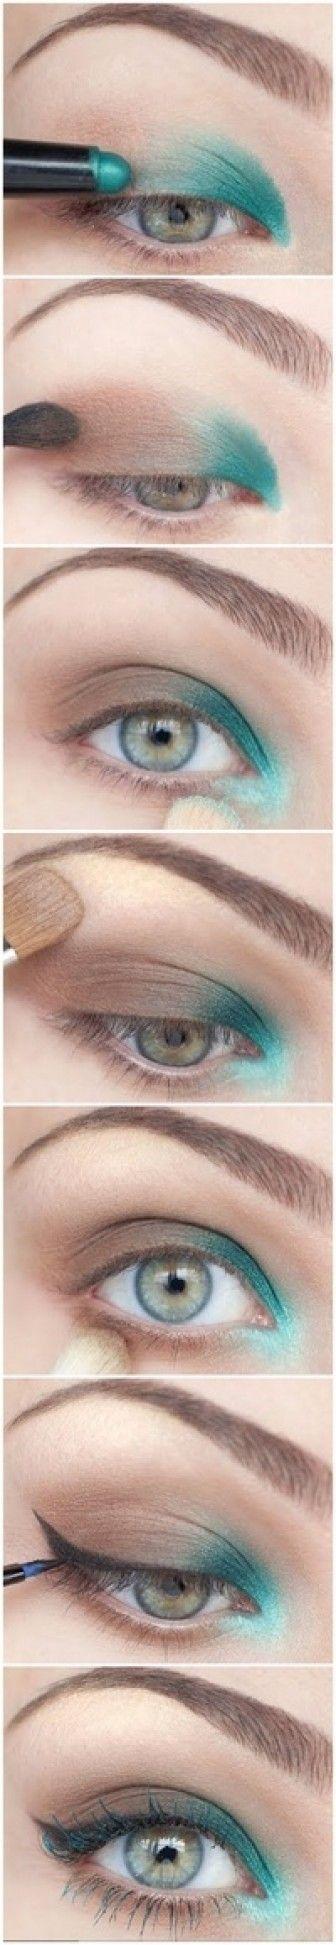 aqua green eye makeup